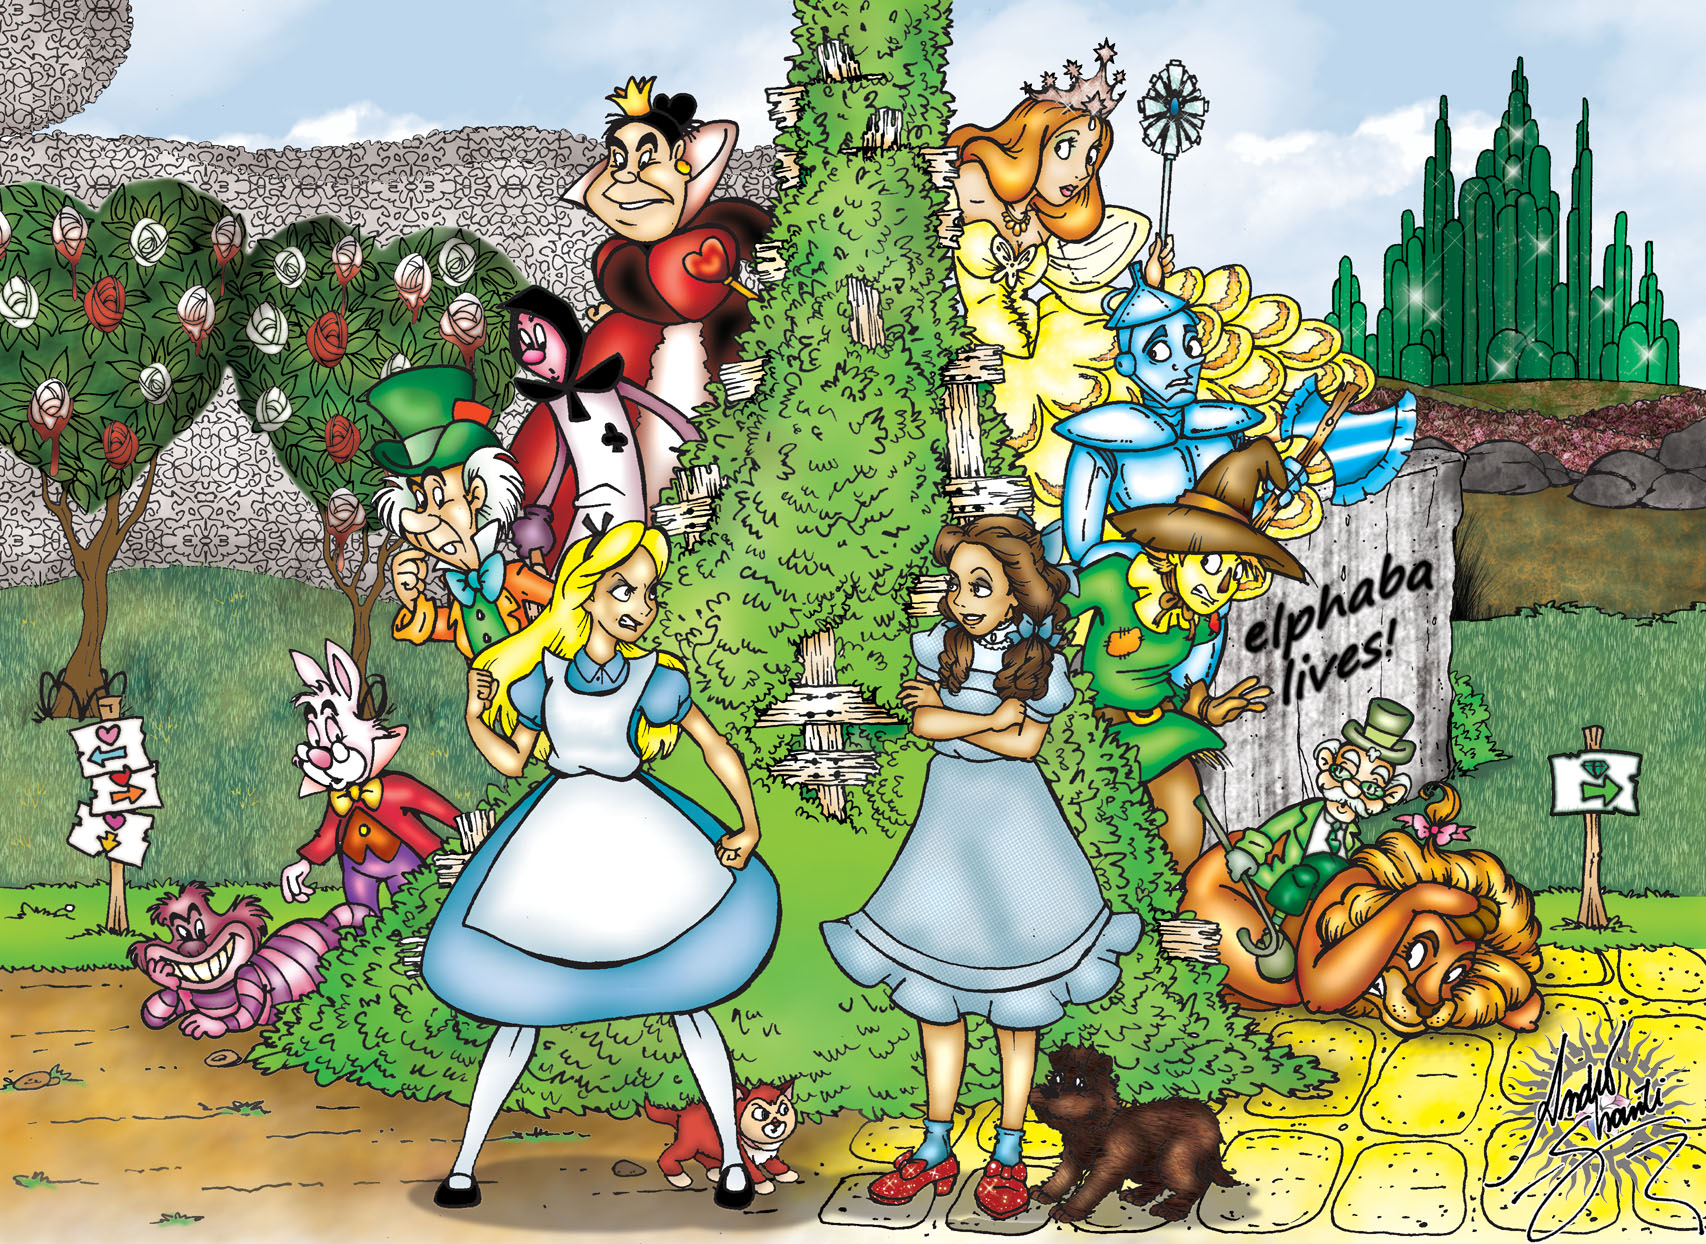 [Disney] Le Monde Fantastique d'Oz (13 mars 2013) - Page 10 Alice_versus_dorothy_by_andreshanti-d37395u